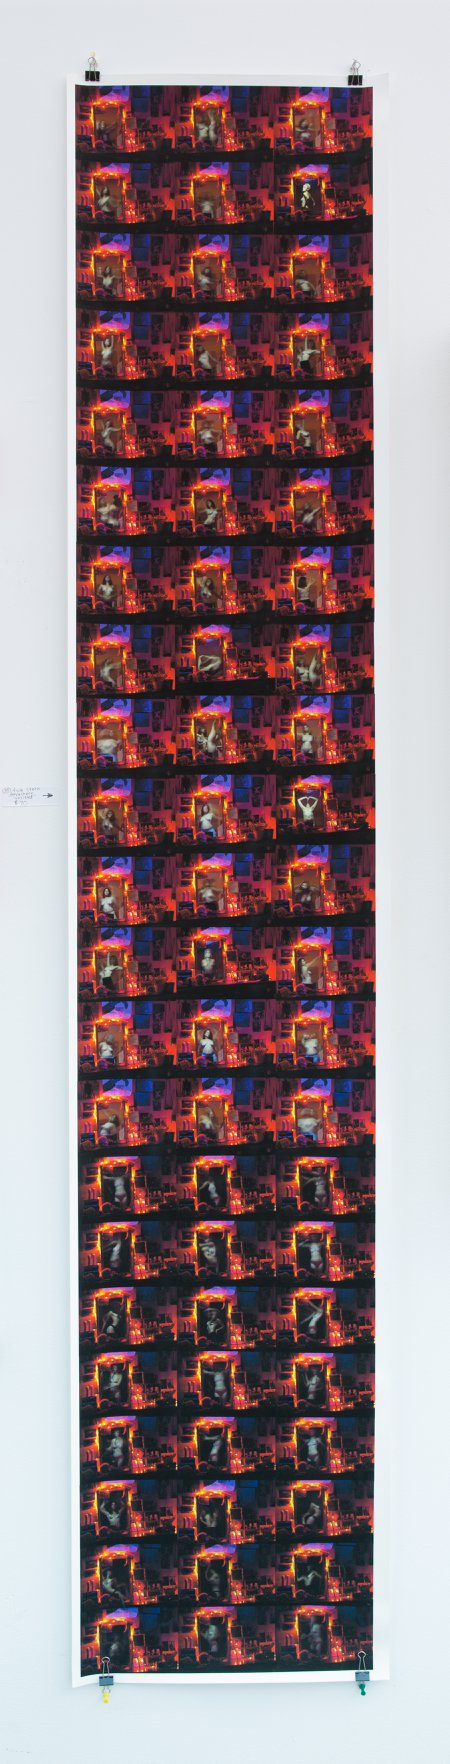 "Ayla Stern - ""Untitled"" Insta: @AylaStern  For Sale: $70"